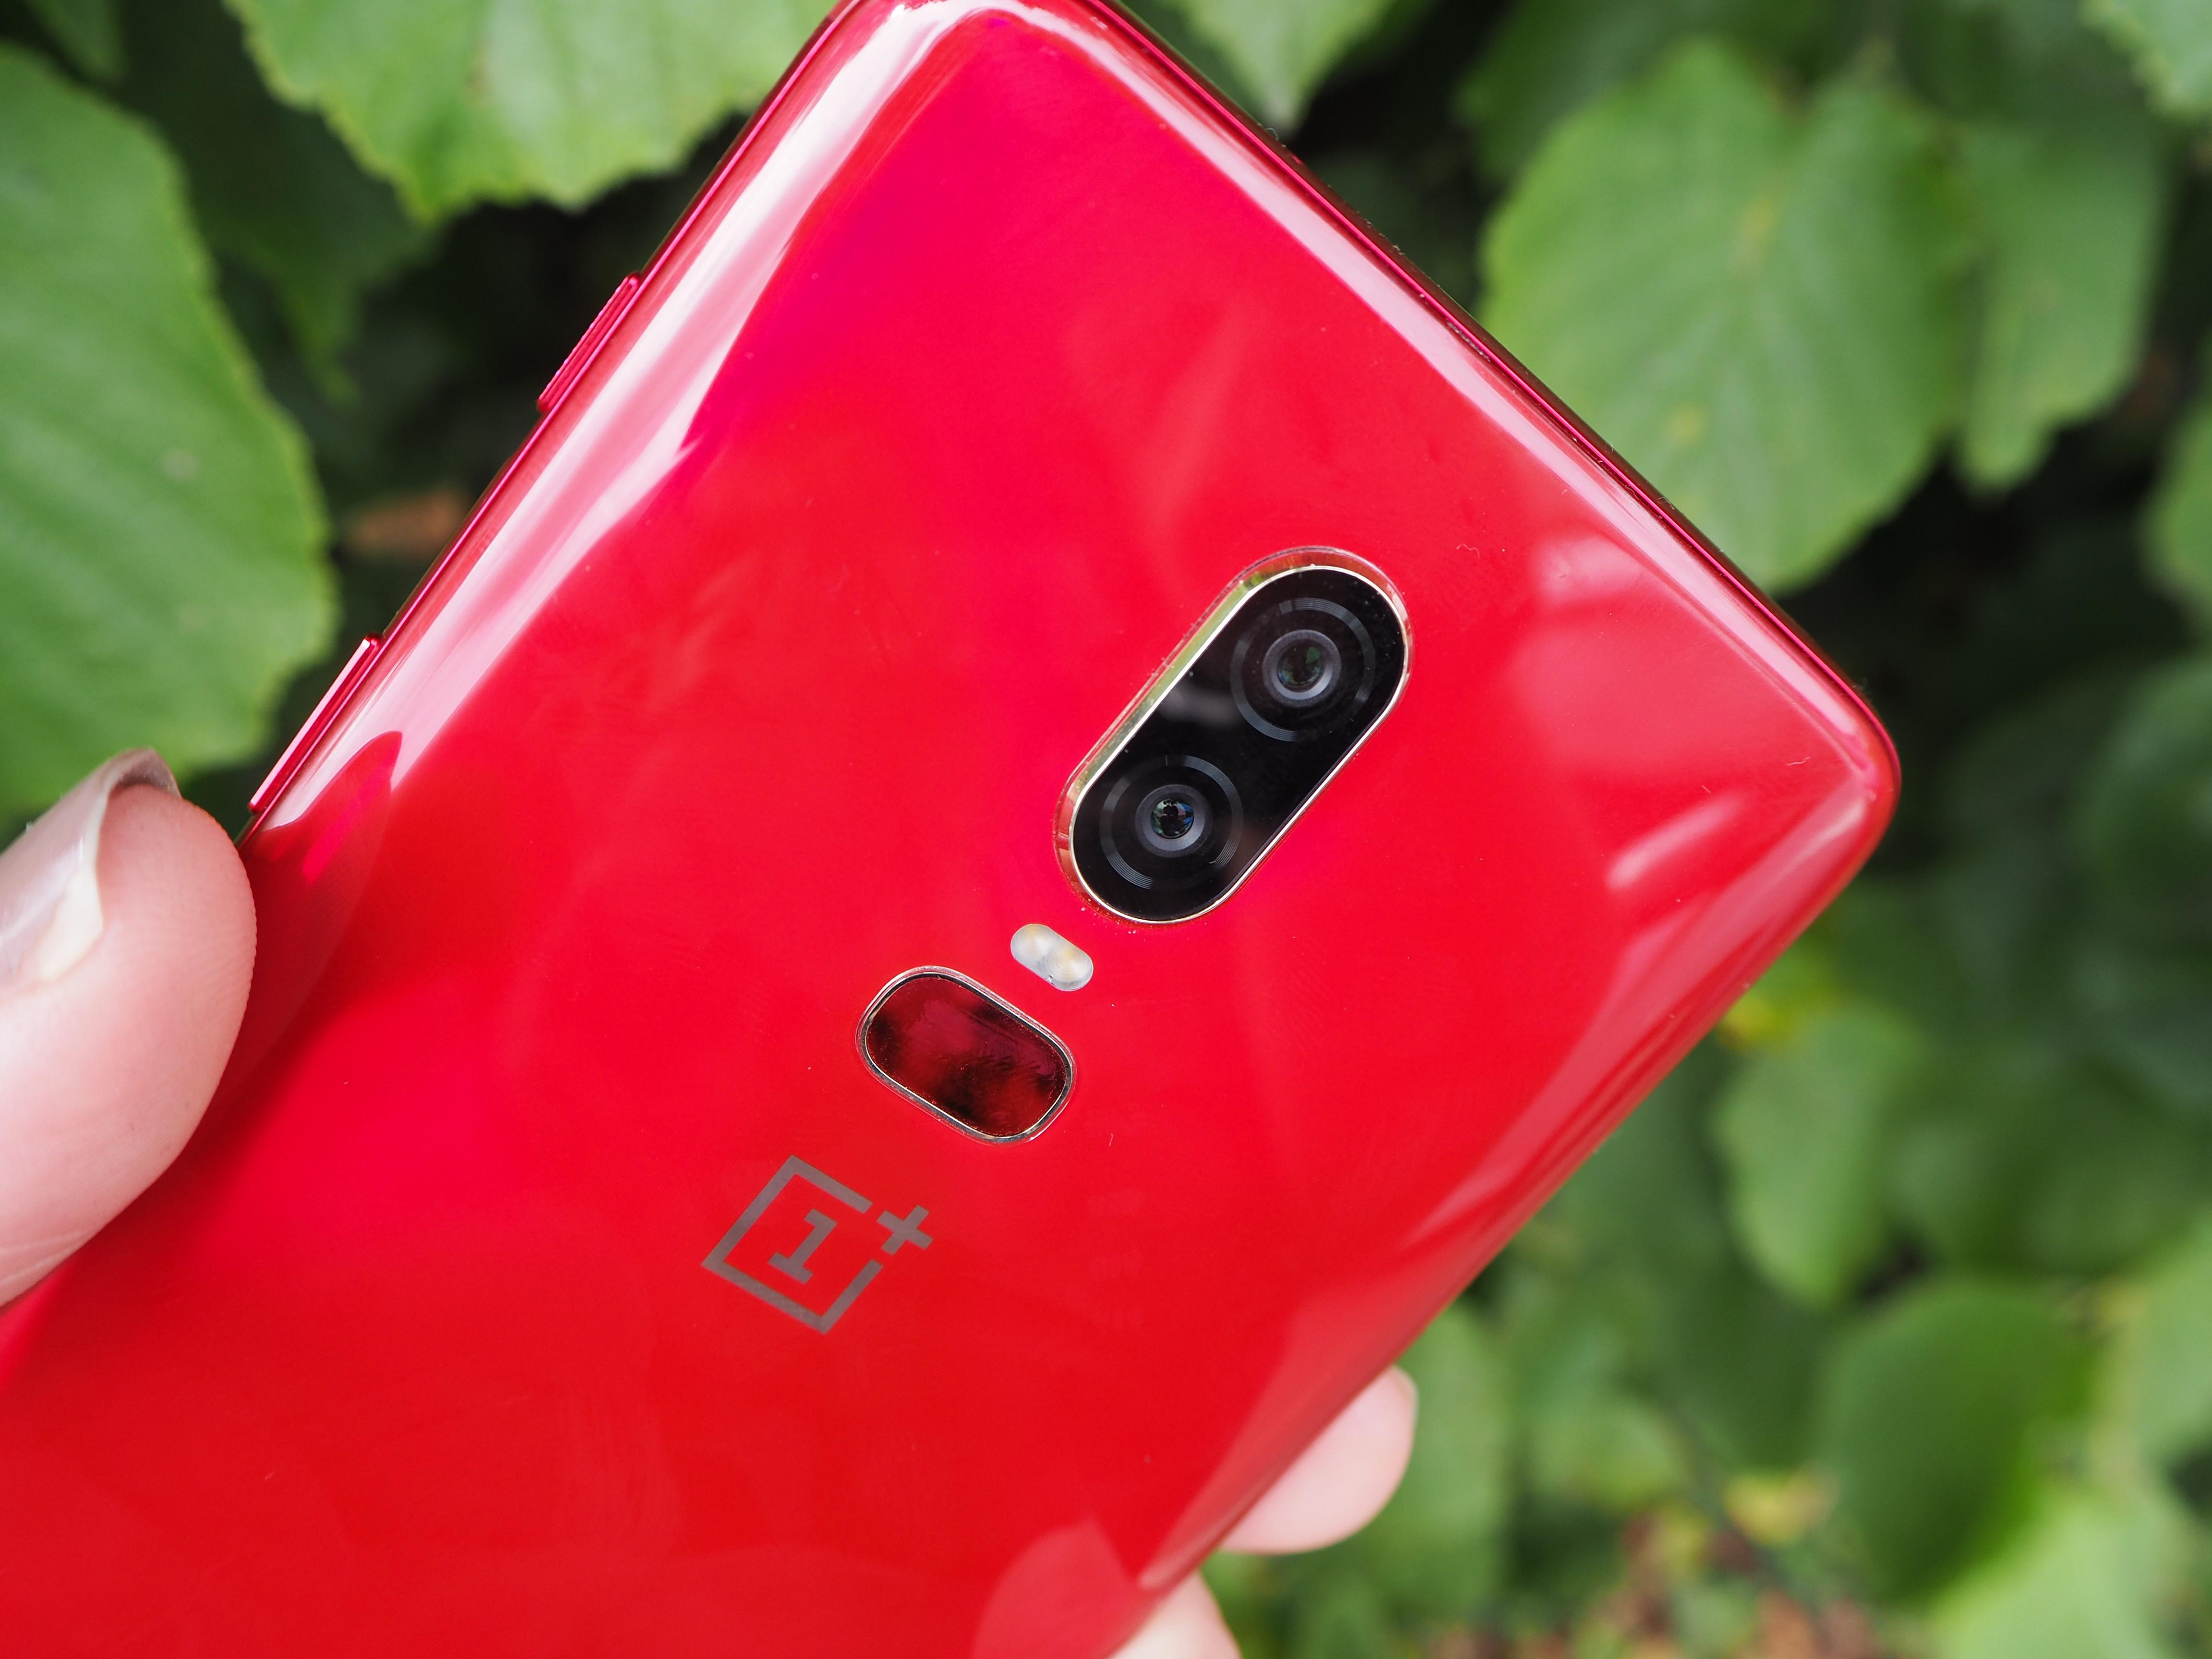 OnePlus 6 Red Review | ePHOTOzine